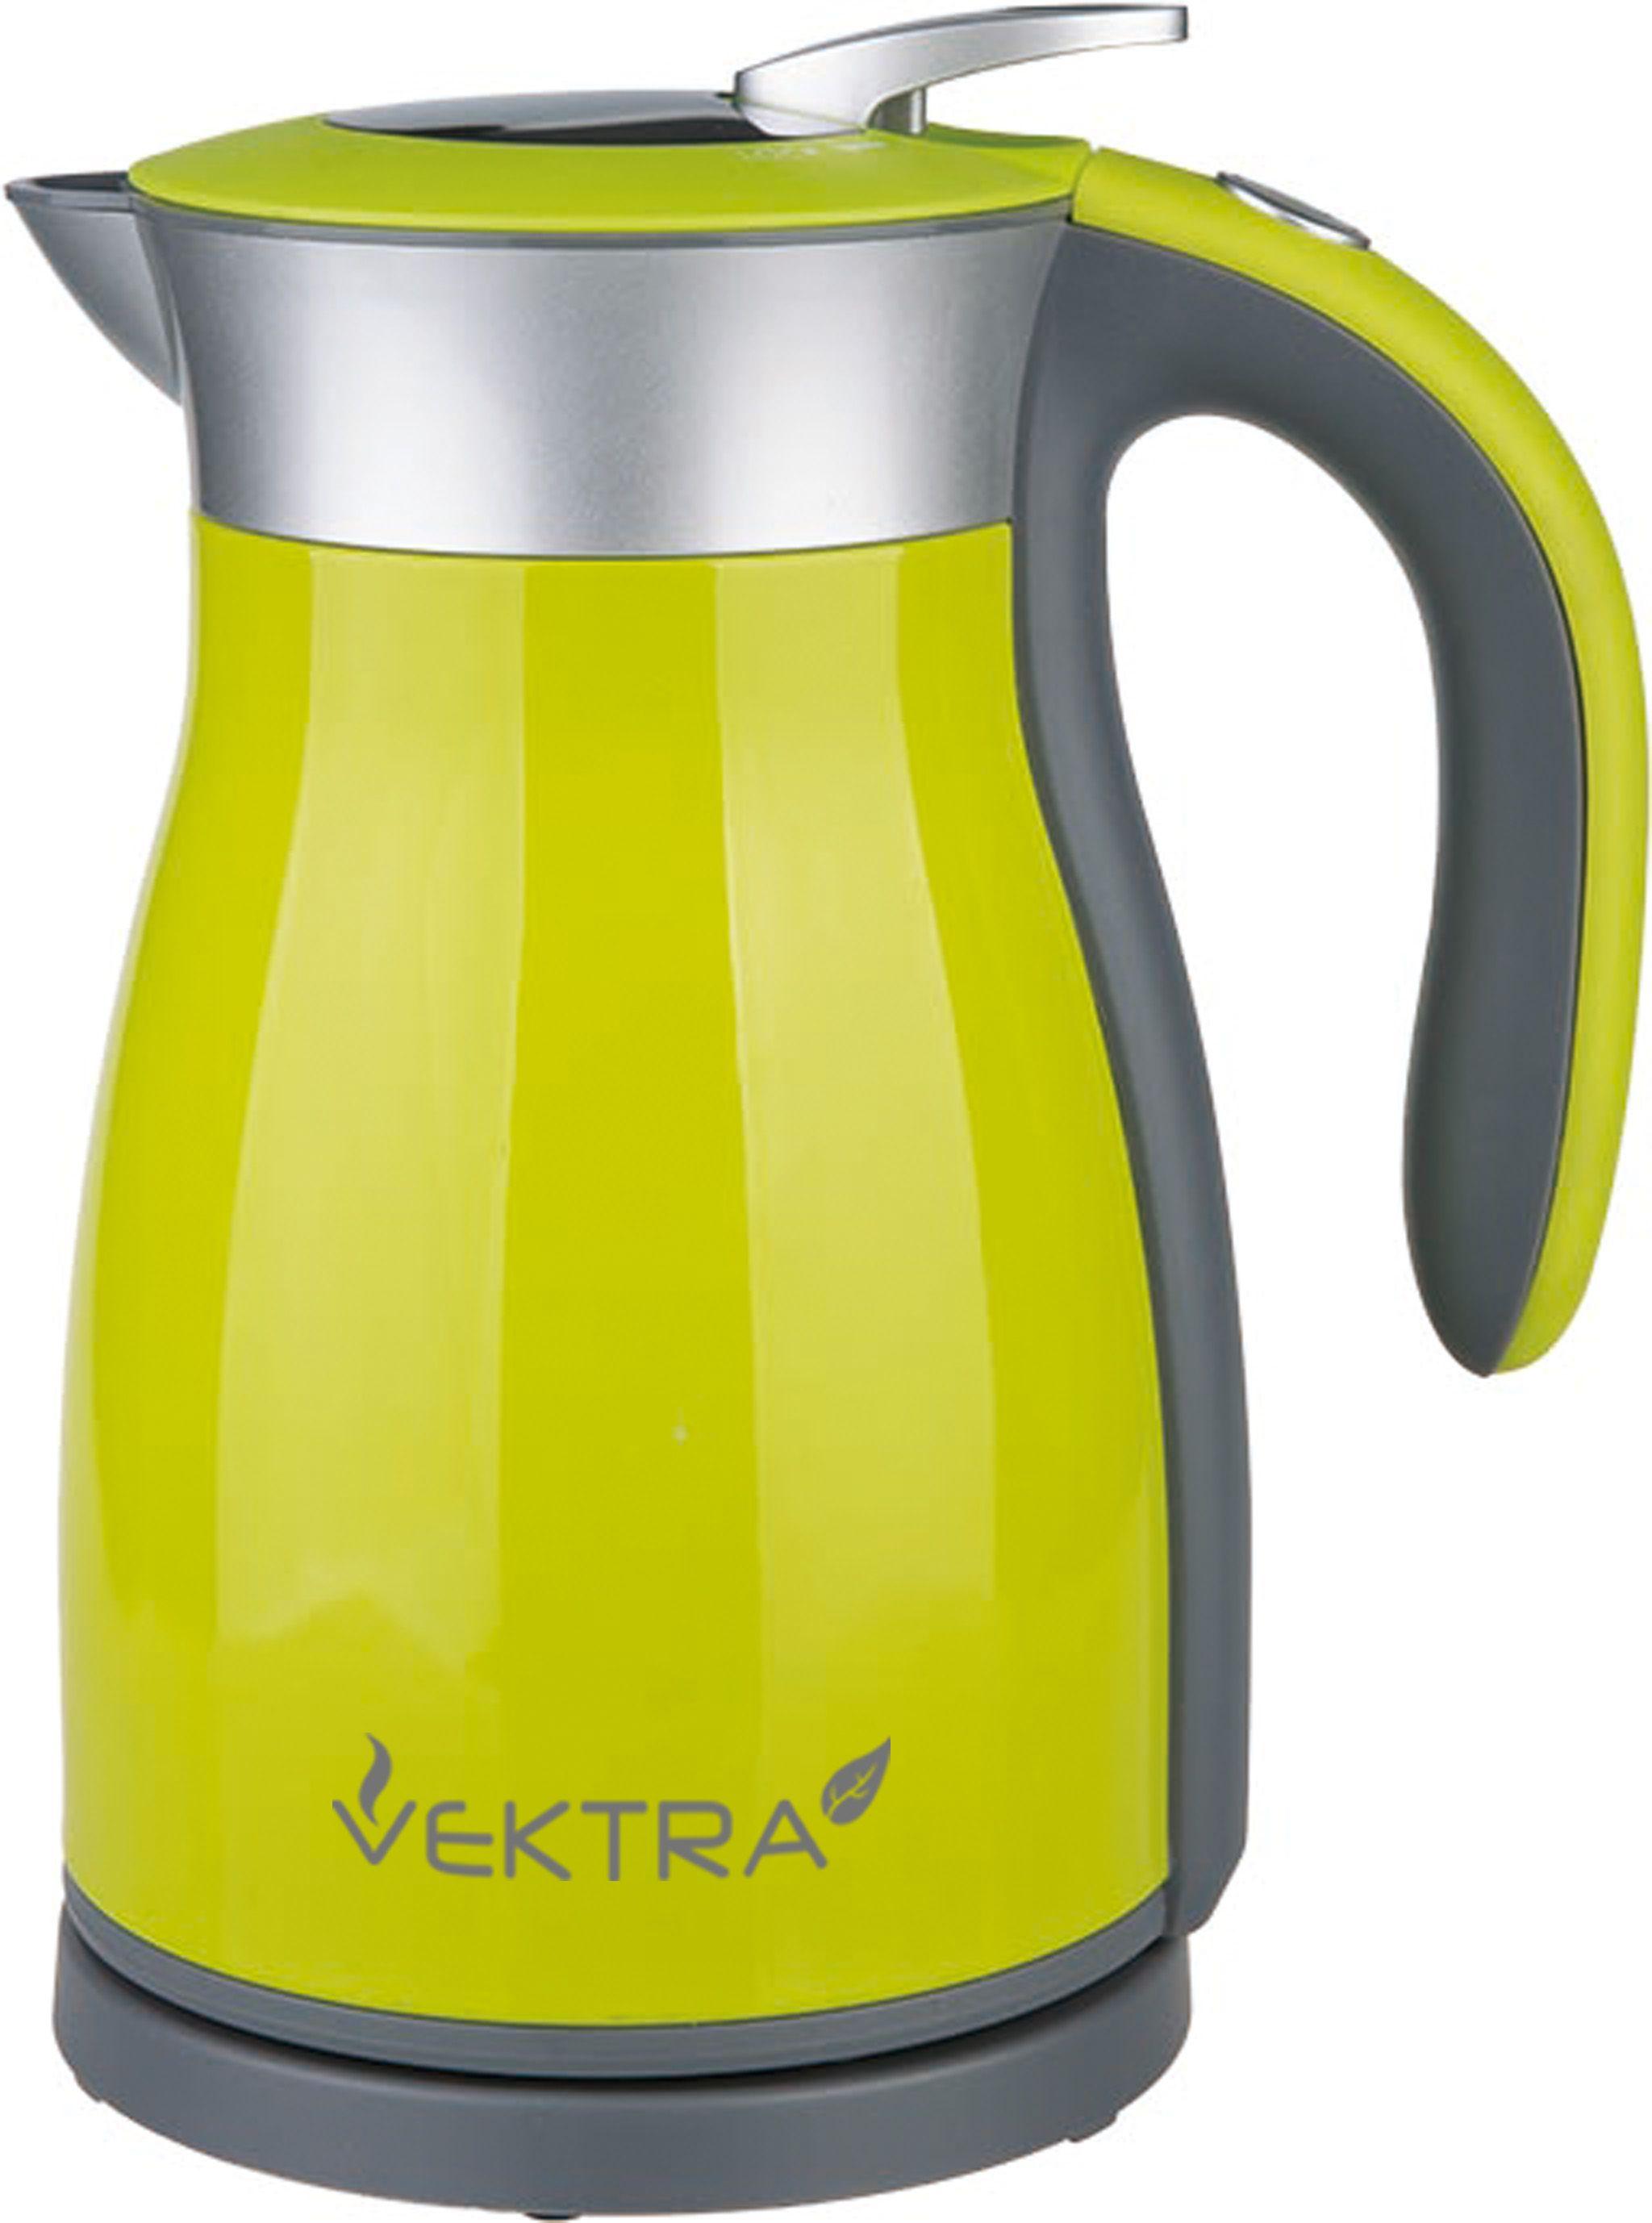 The Green Vektra 1 Series Kettle Vacuum Insulation Keeps